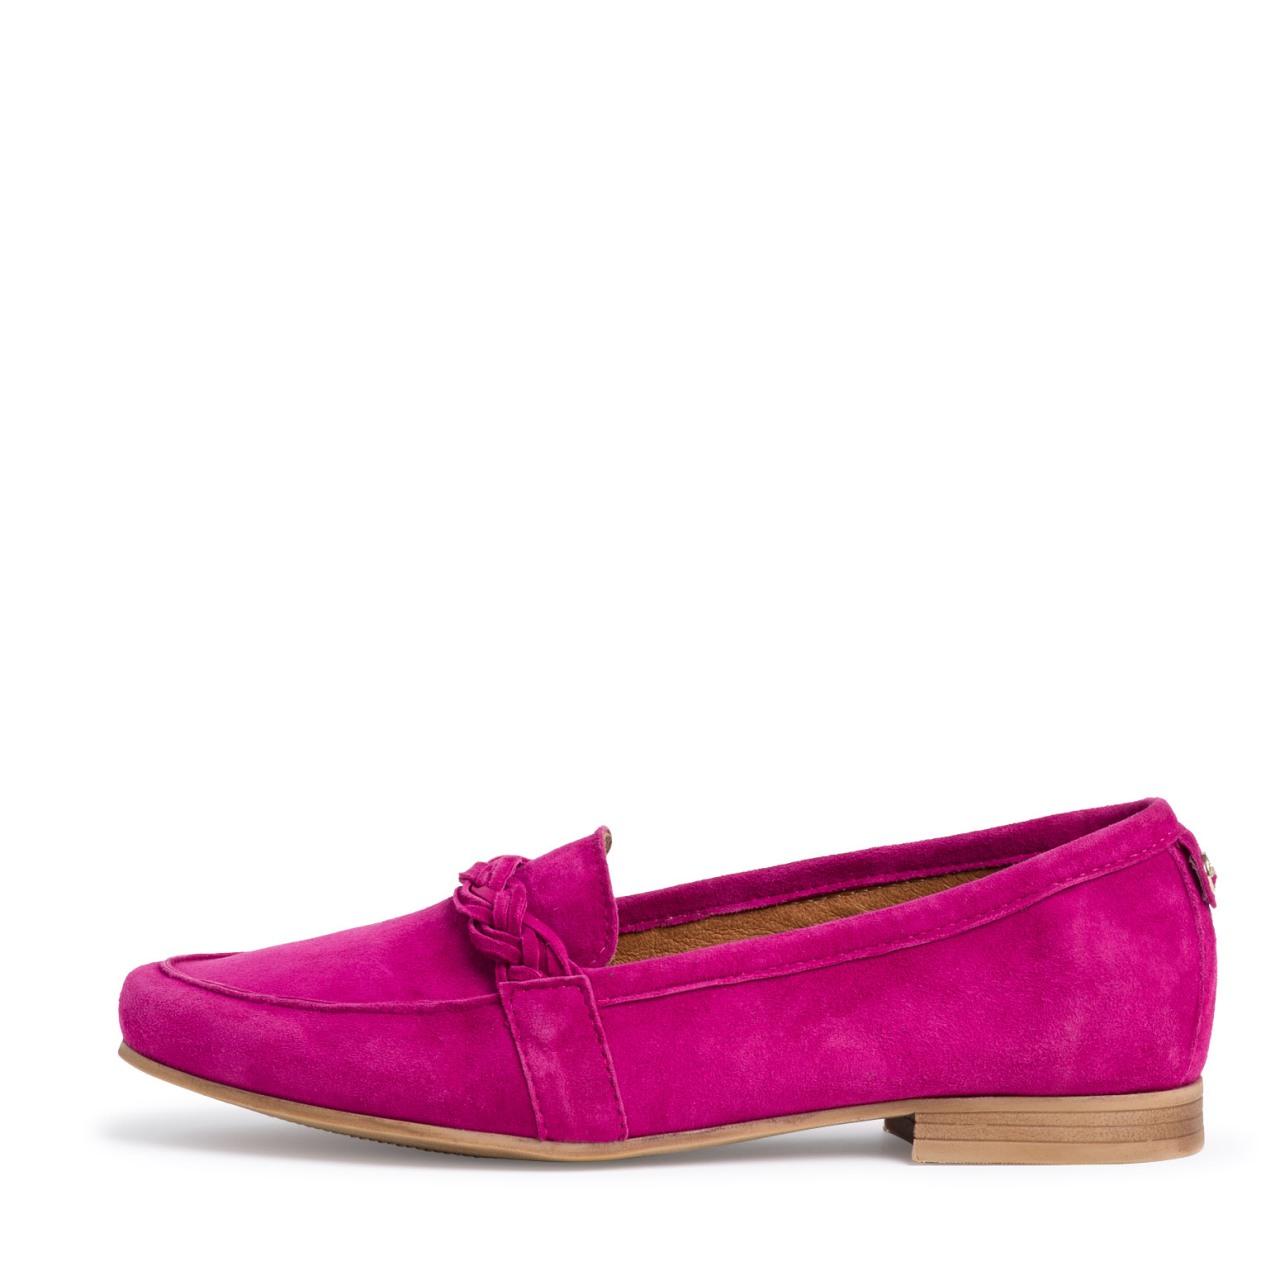 Berwick upon Tweed-Lime Shoe Co-Tamaris-Loafer-Pink-Spring Summer-Suede